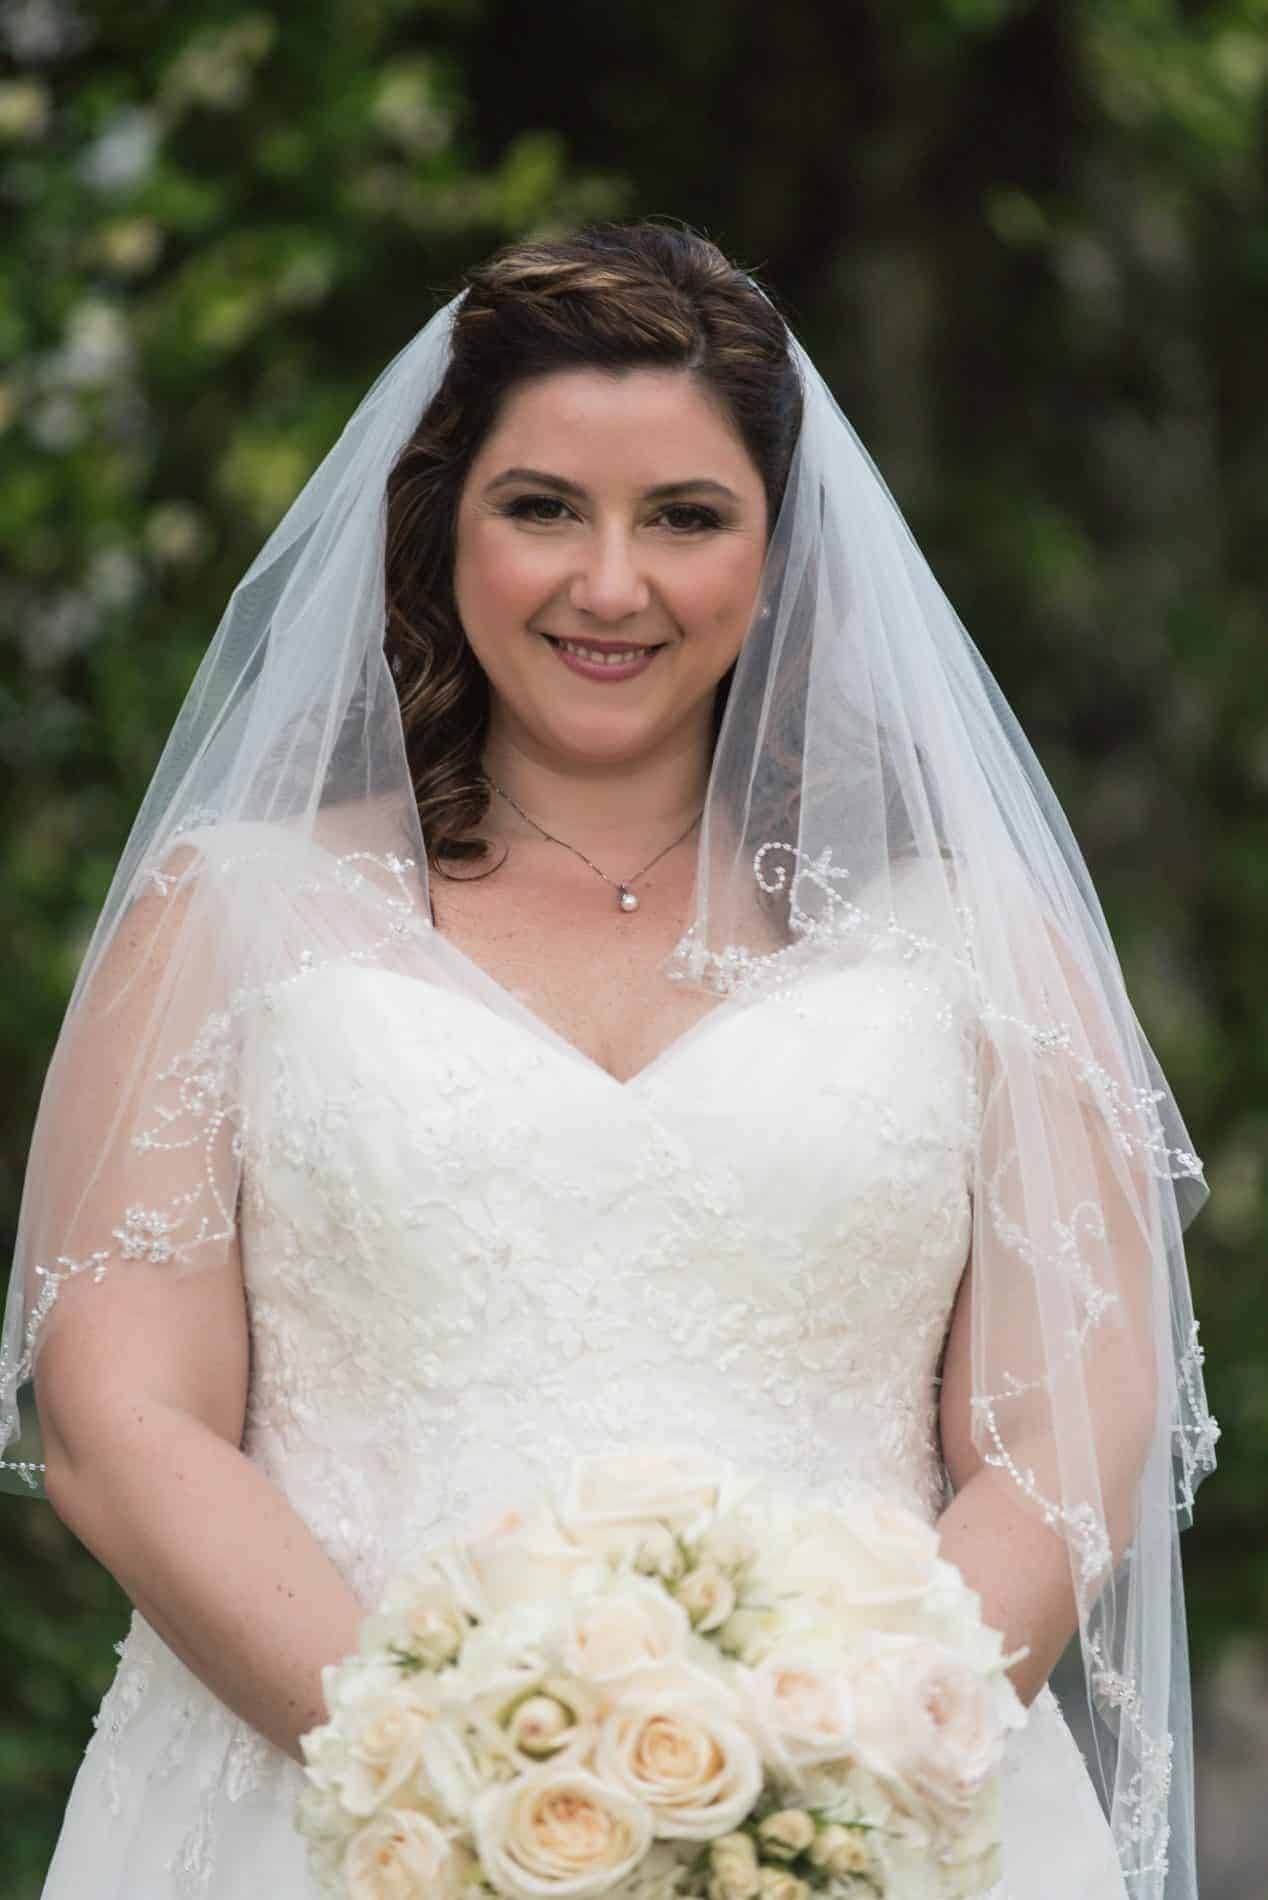 Beautiful Italian Bride on the day of her Lake Mary Italian Wedding